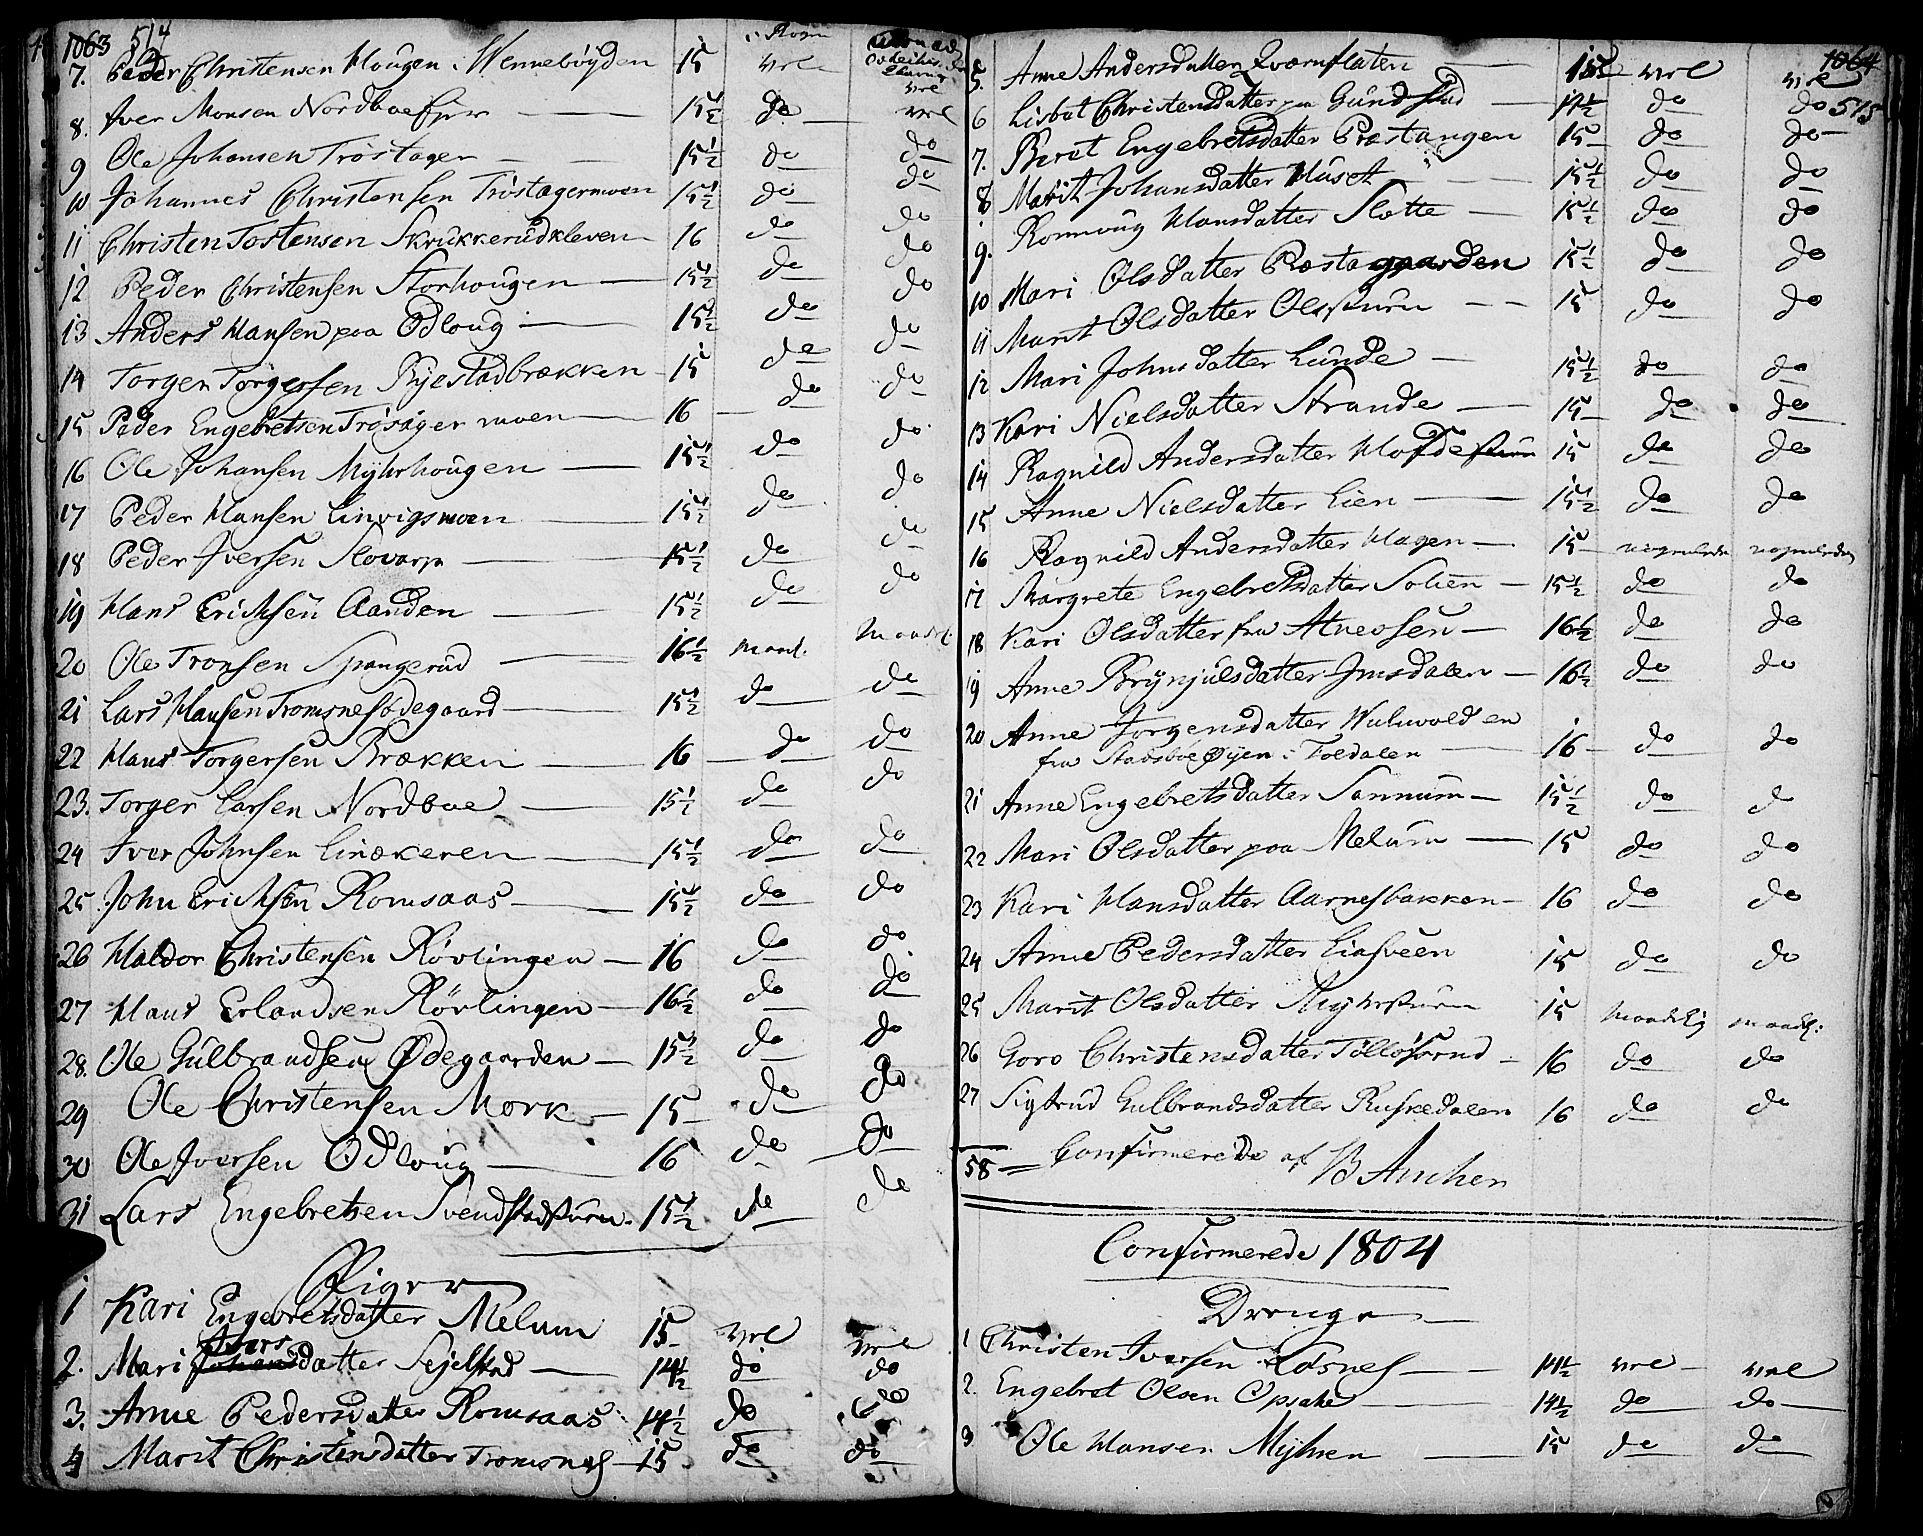 SAH, Ringebu prestekontor, Ministerialbok nr. 3, 1781-1820, s. 514-515